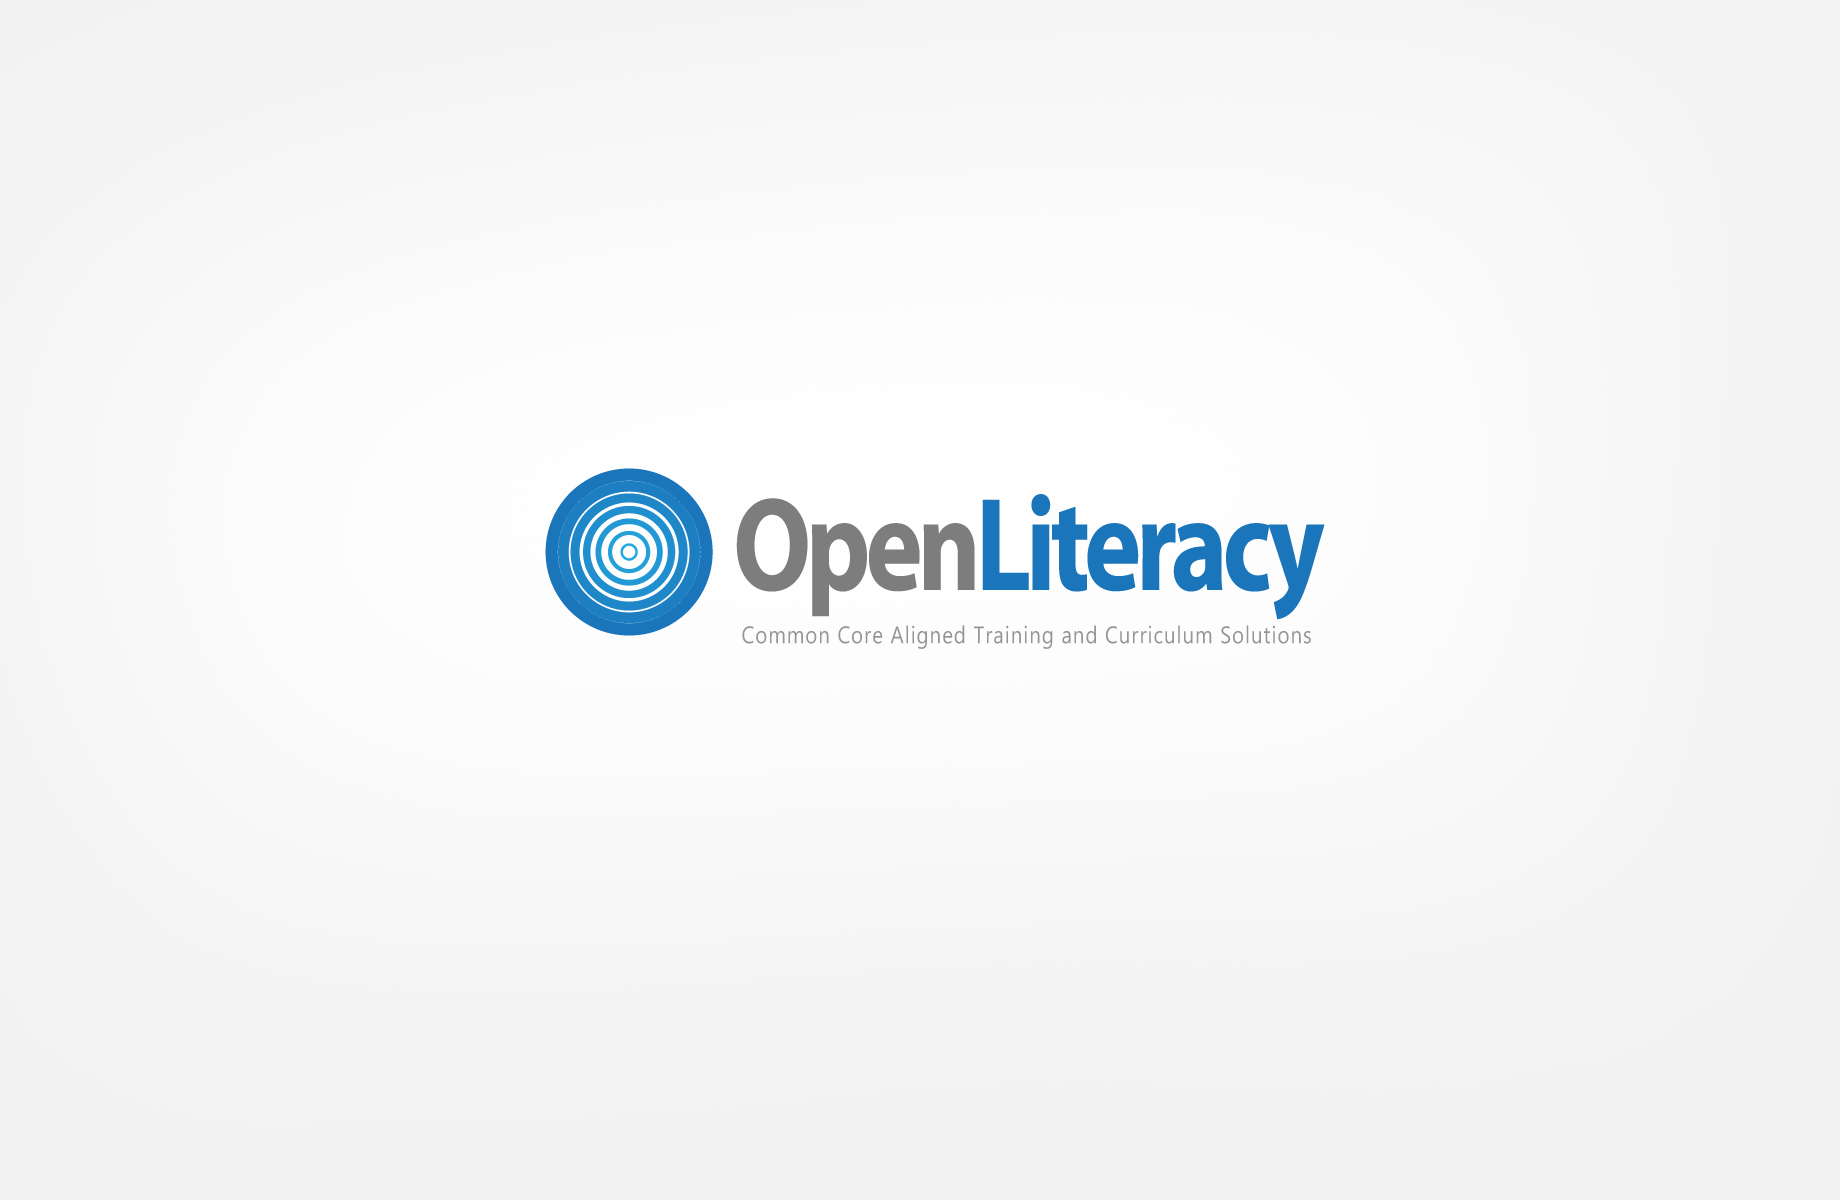 Logo Design by Jan Chua - Entry No. 66 in the Logo Design Contest Inspiring Logo Design for OpenLiteracy.